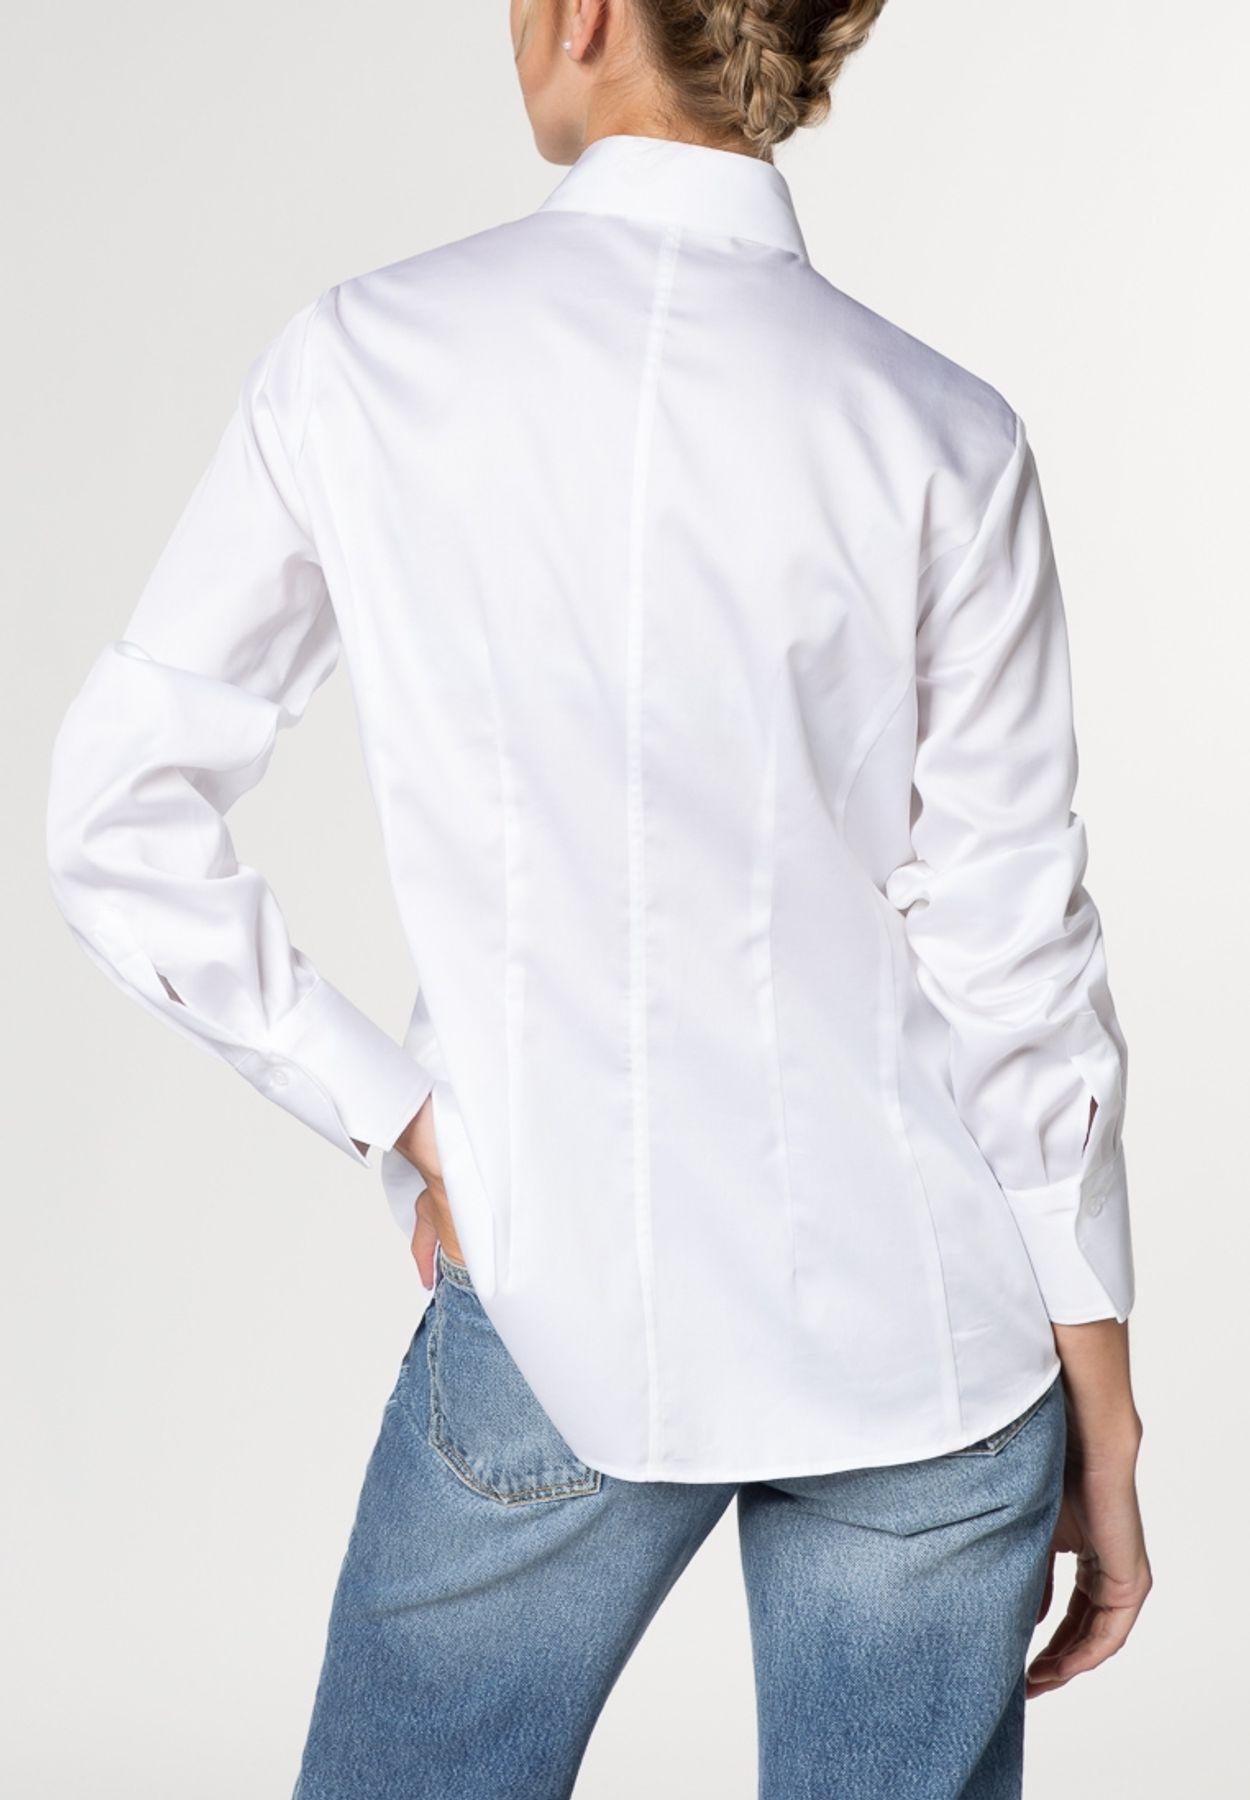 Eterna - Comfort Fit - Damen Langarm Bluse in Weiß (5585 D749) – Bild 3